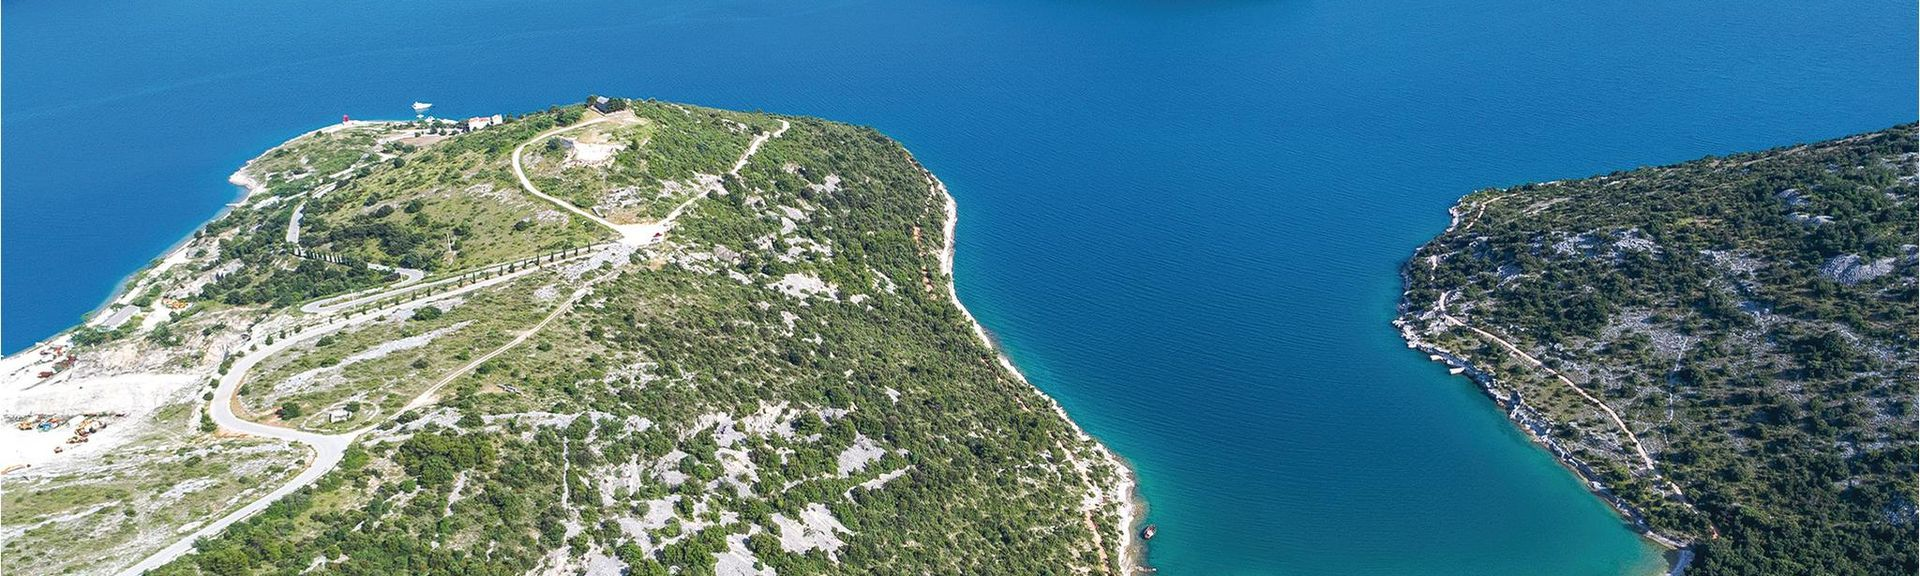 Banjole, Medulin, Istria (county), Croatia